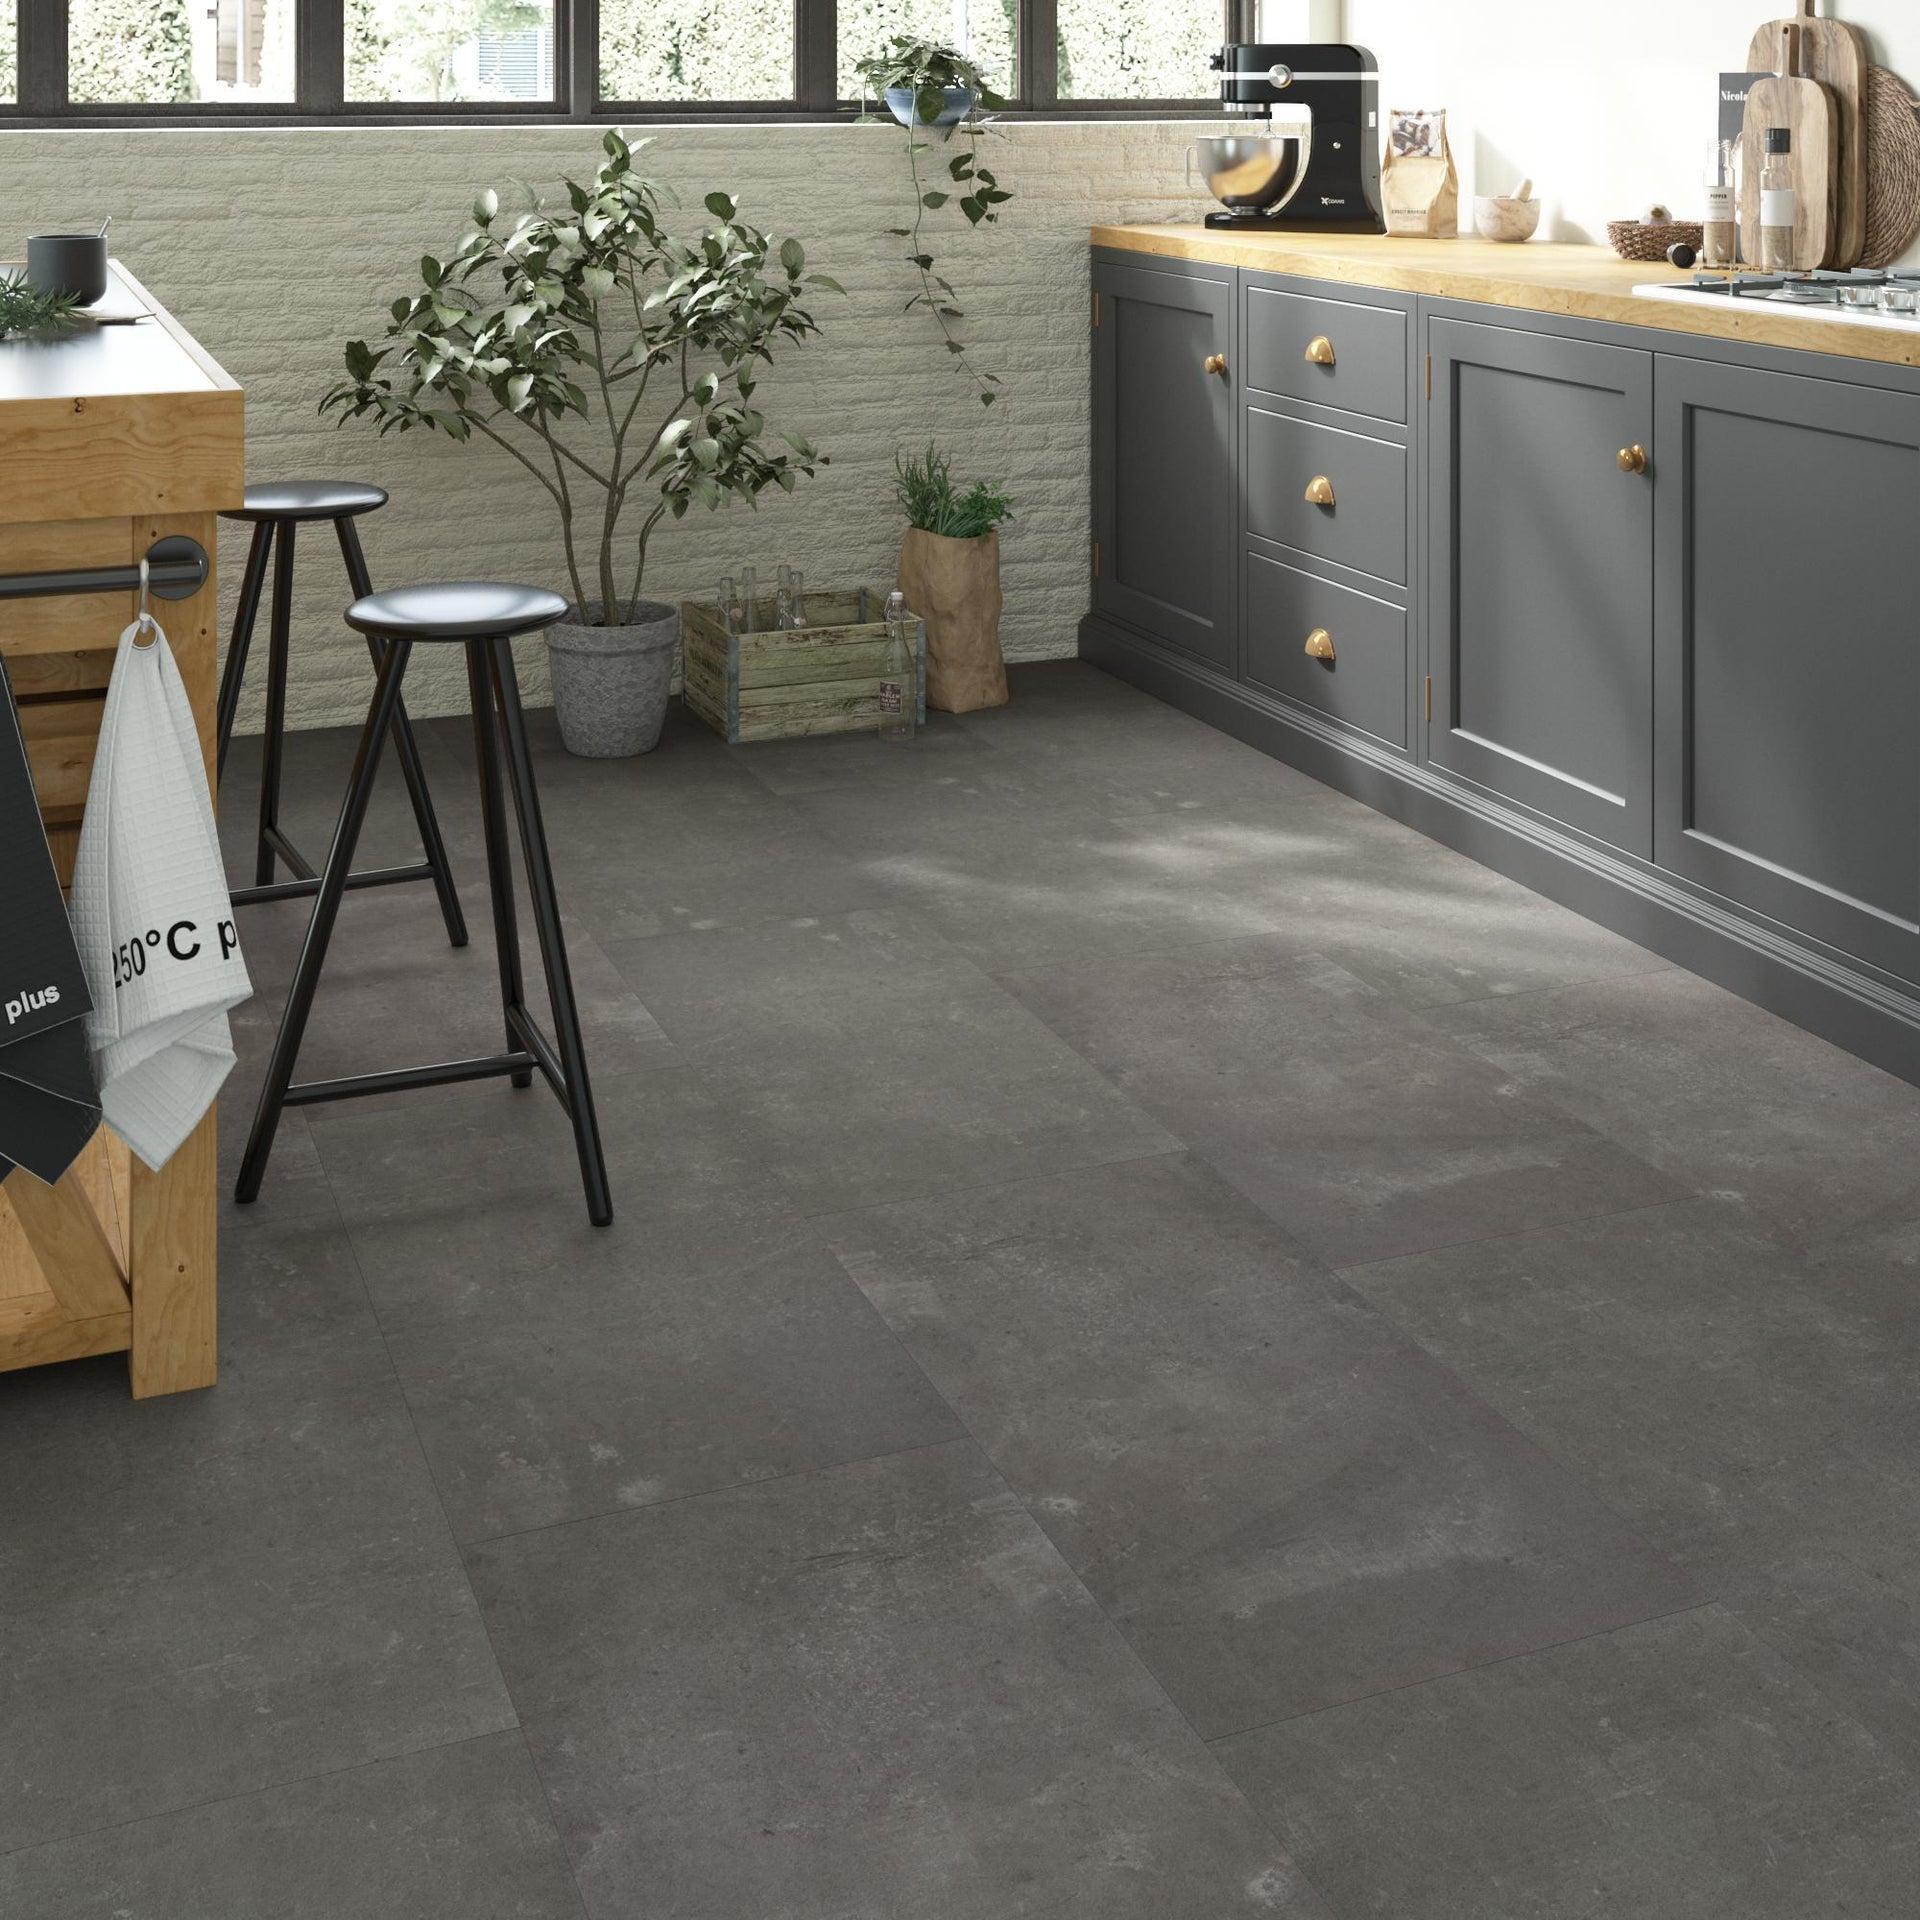 Pavimento PVC flottante clic+ Juke Sp 5 mm grigio / argento - 1